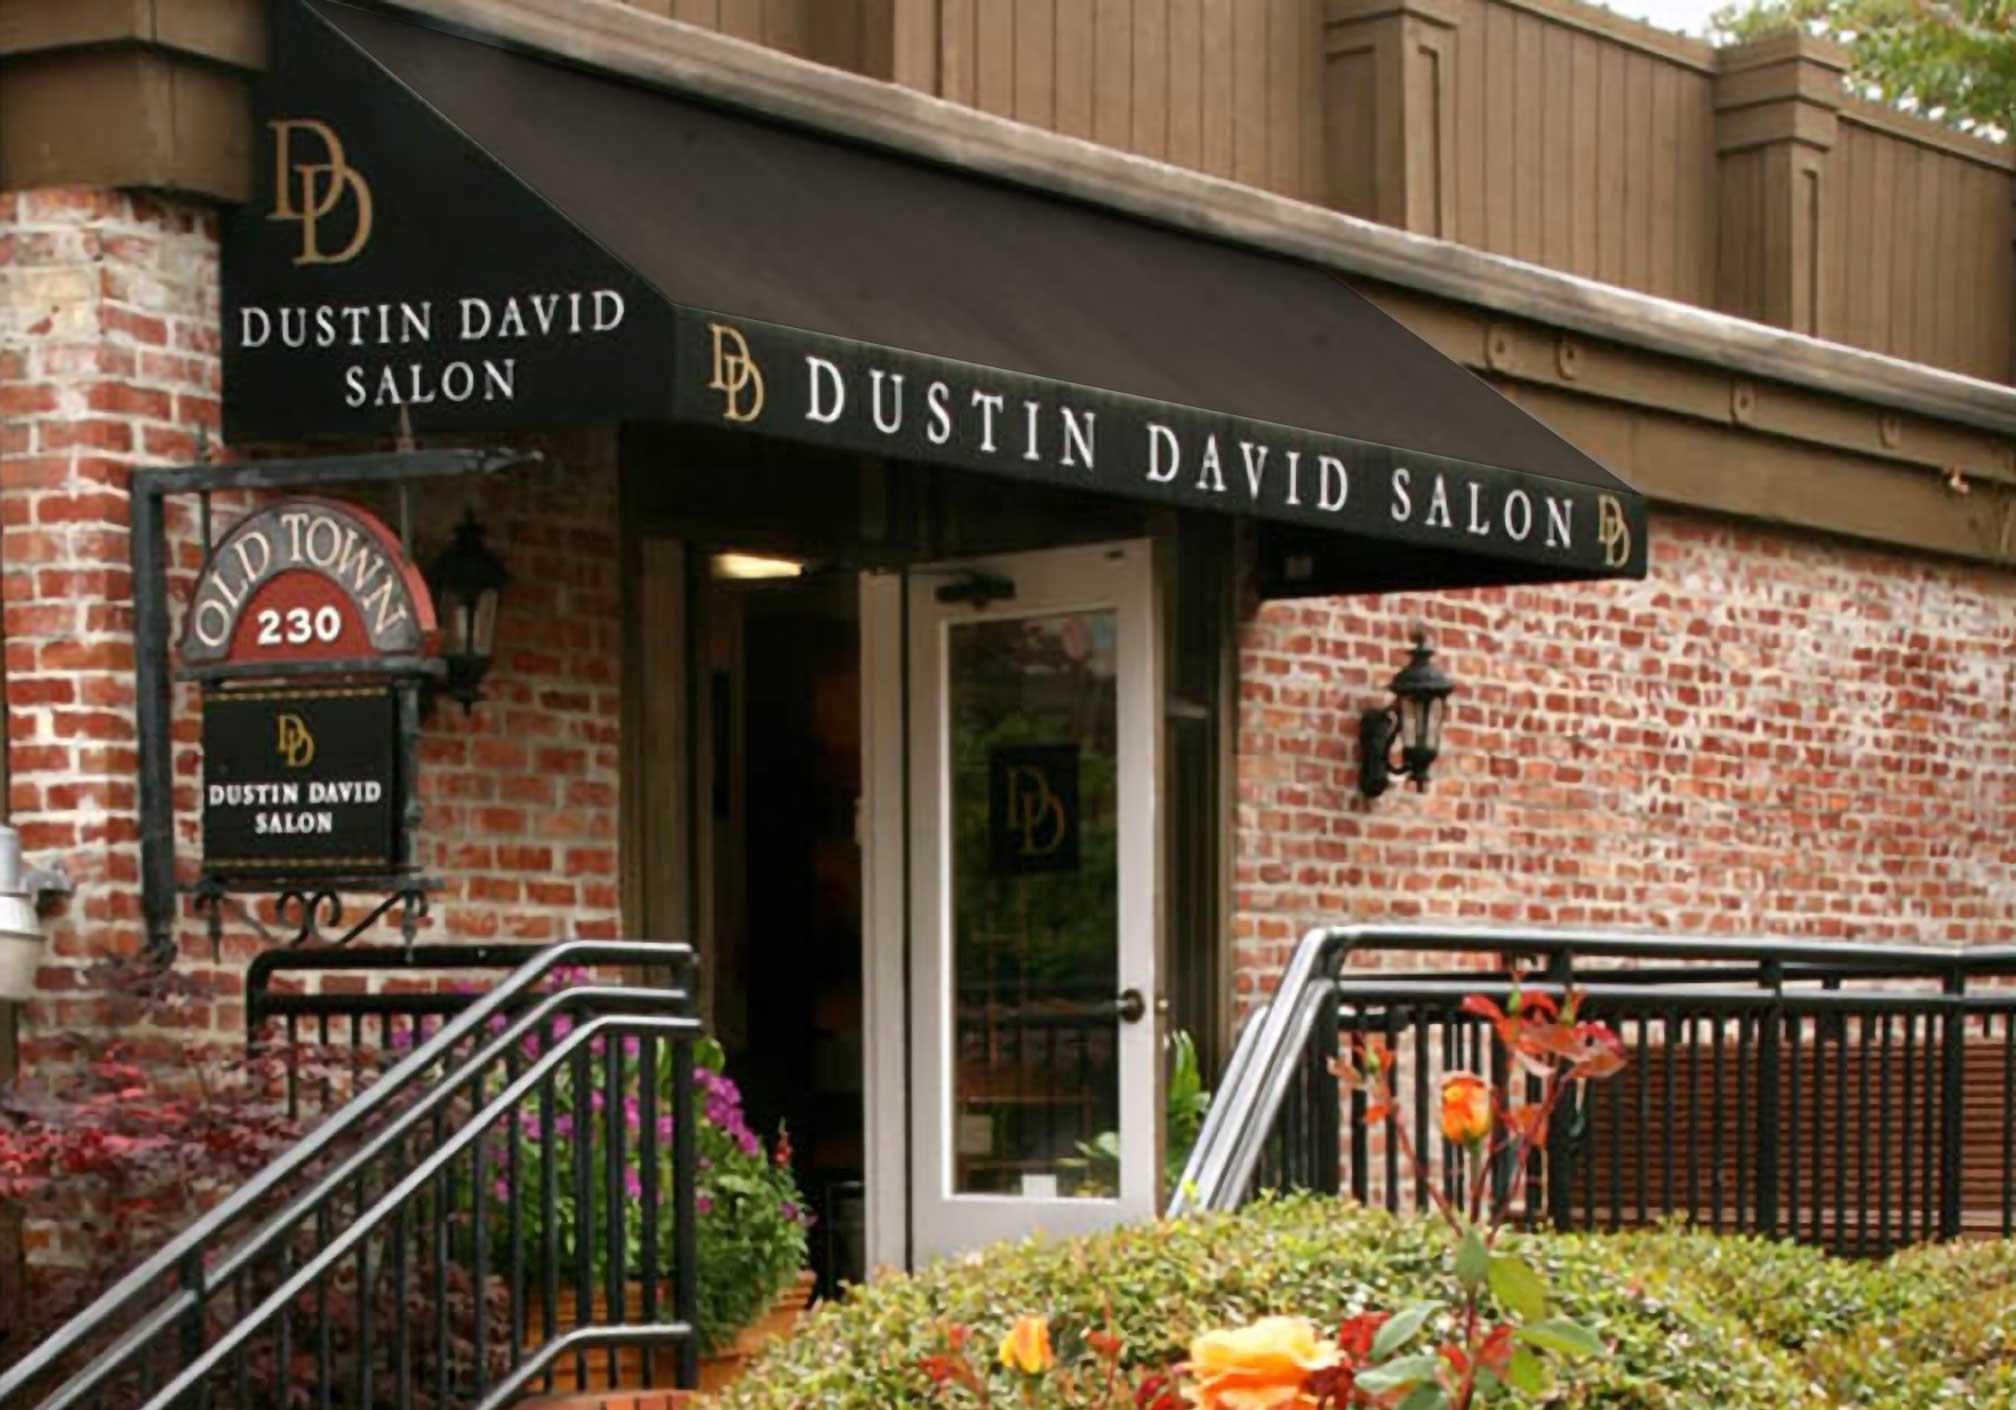 Dustin David Salon